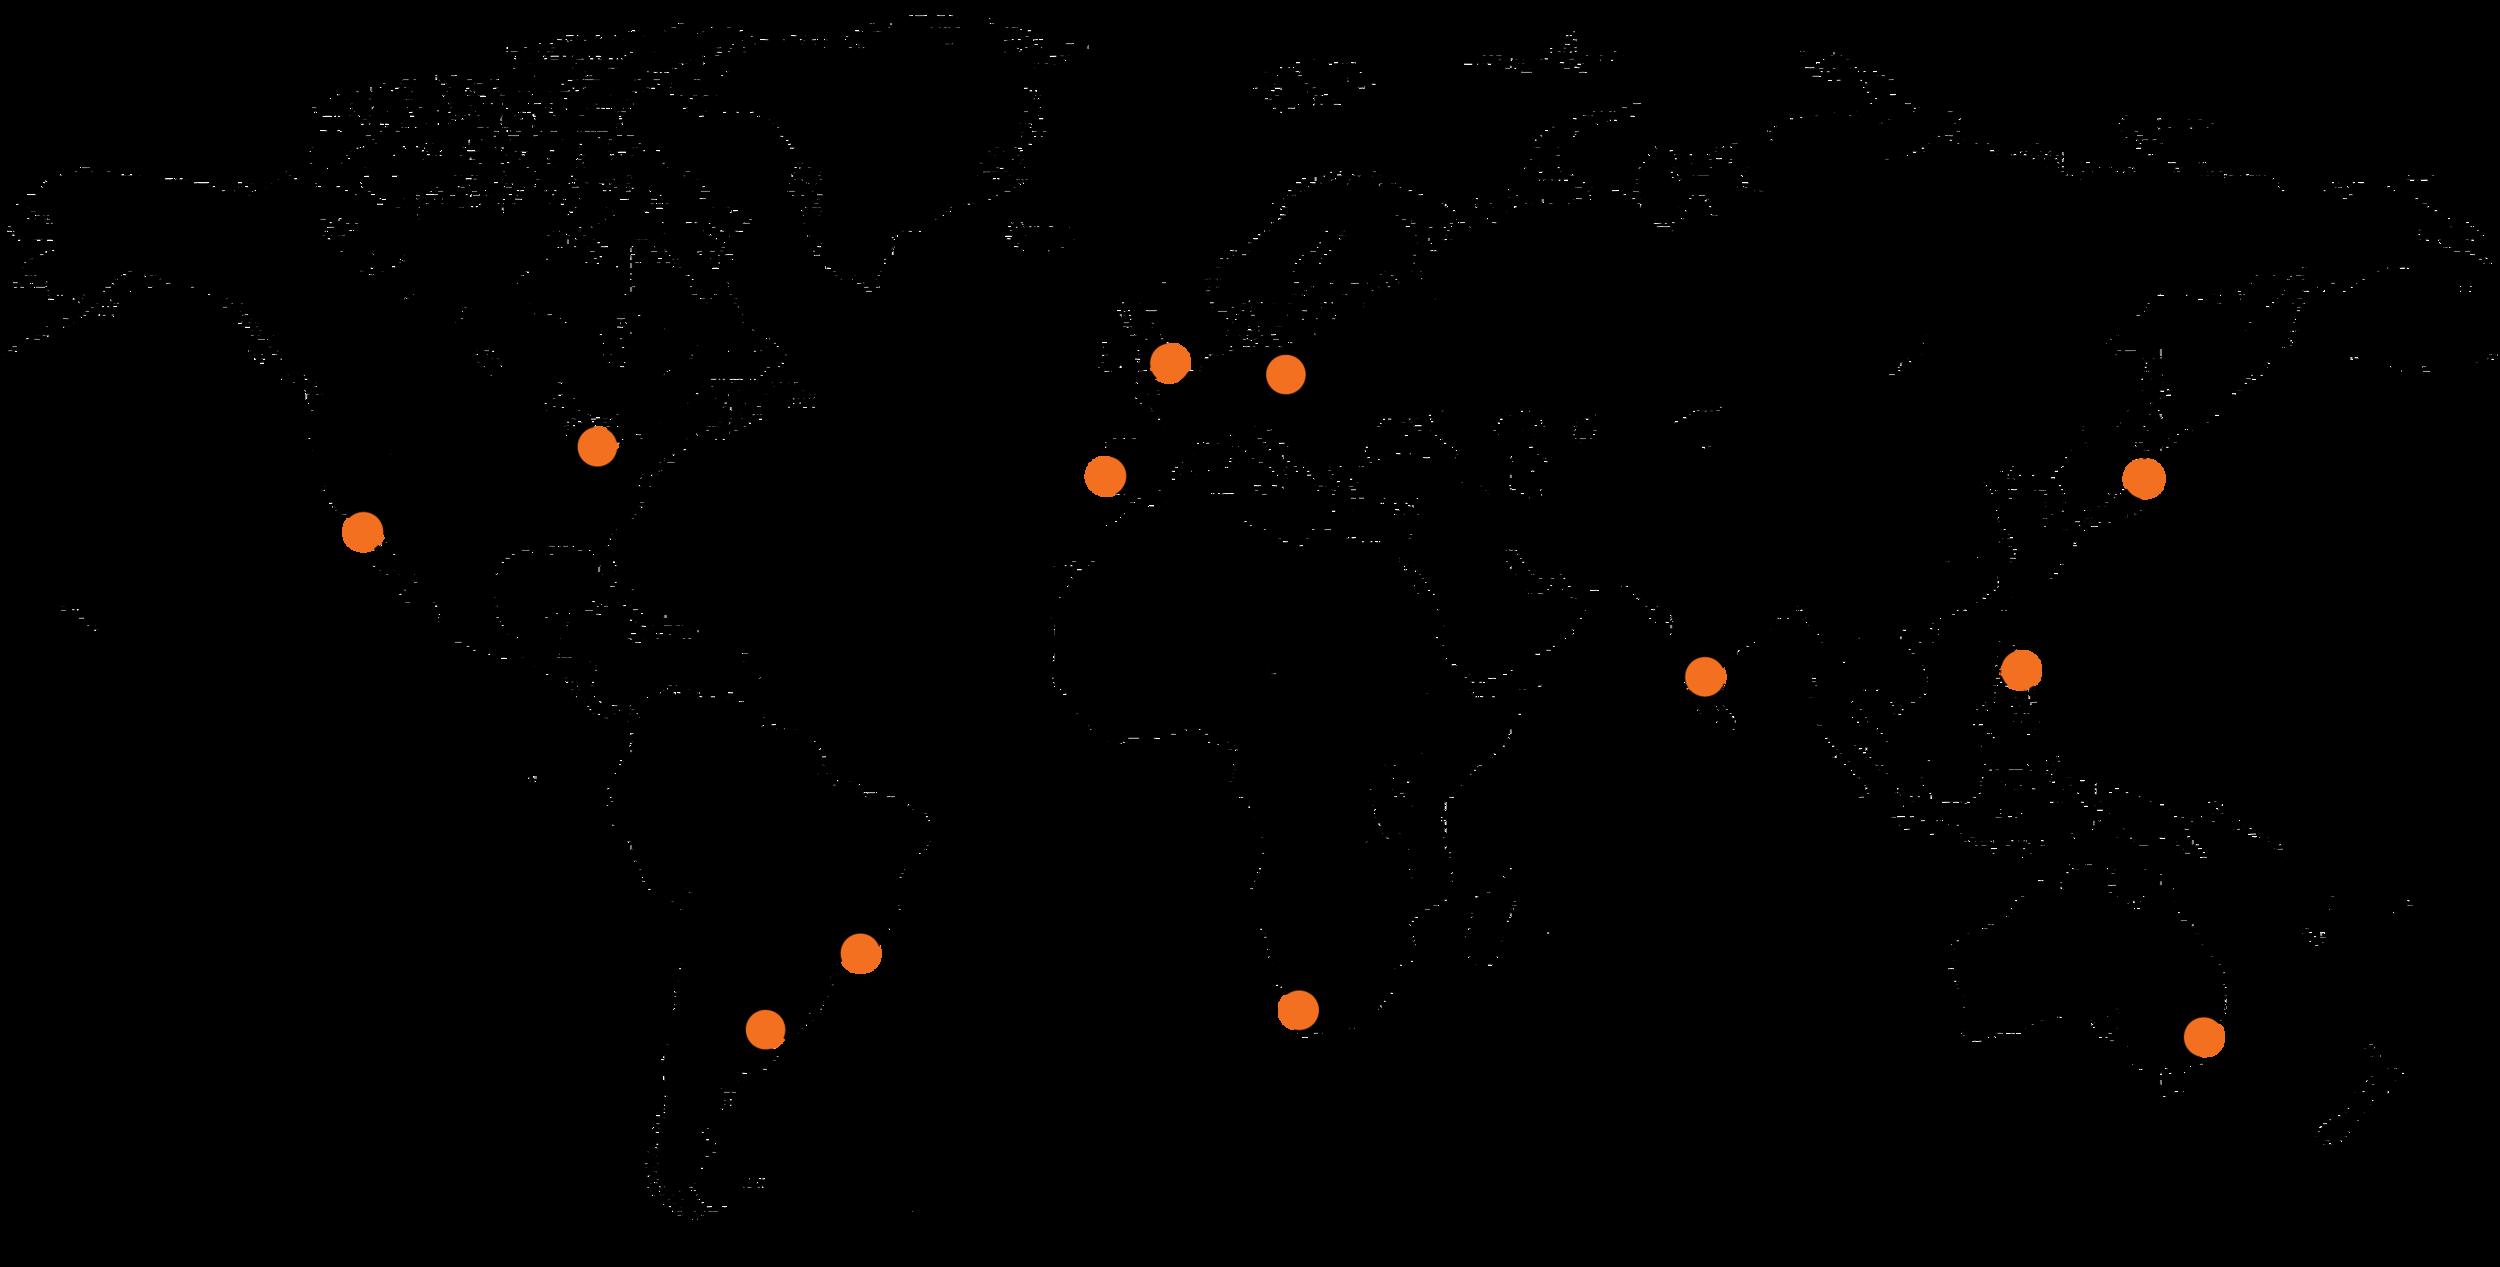 worldmap_noborders_detailed_dots.png